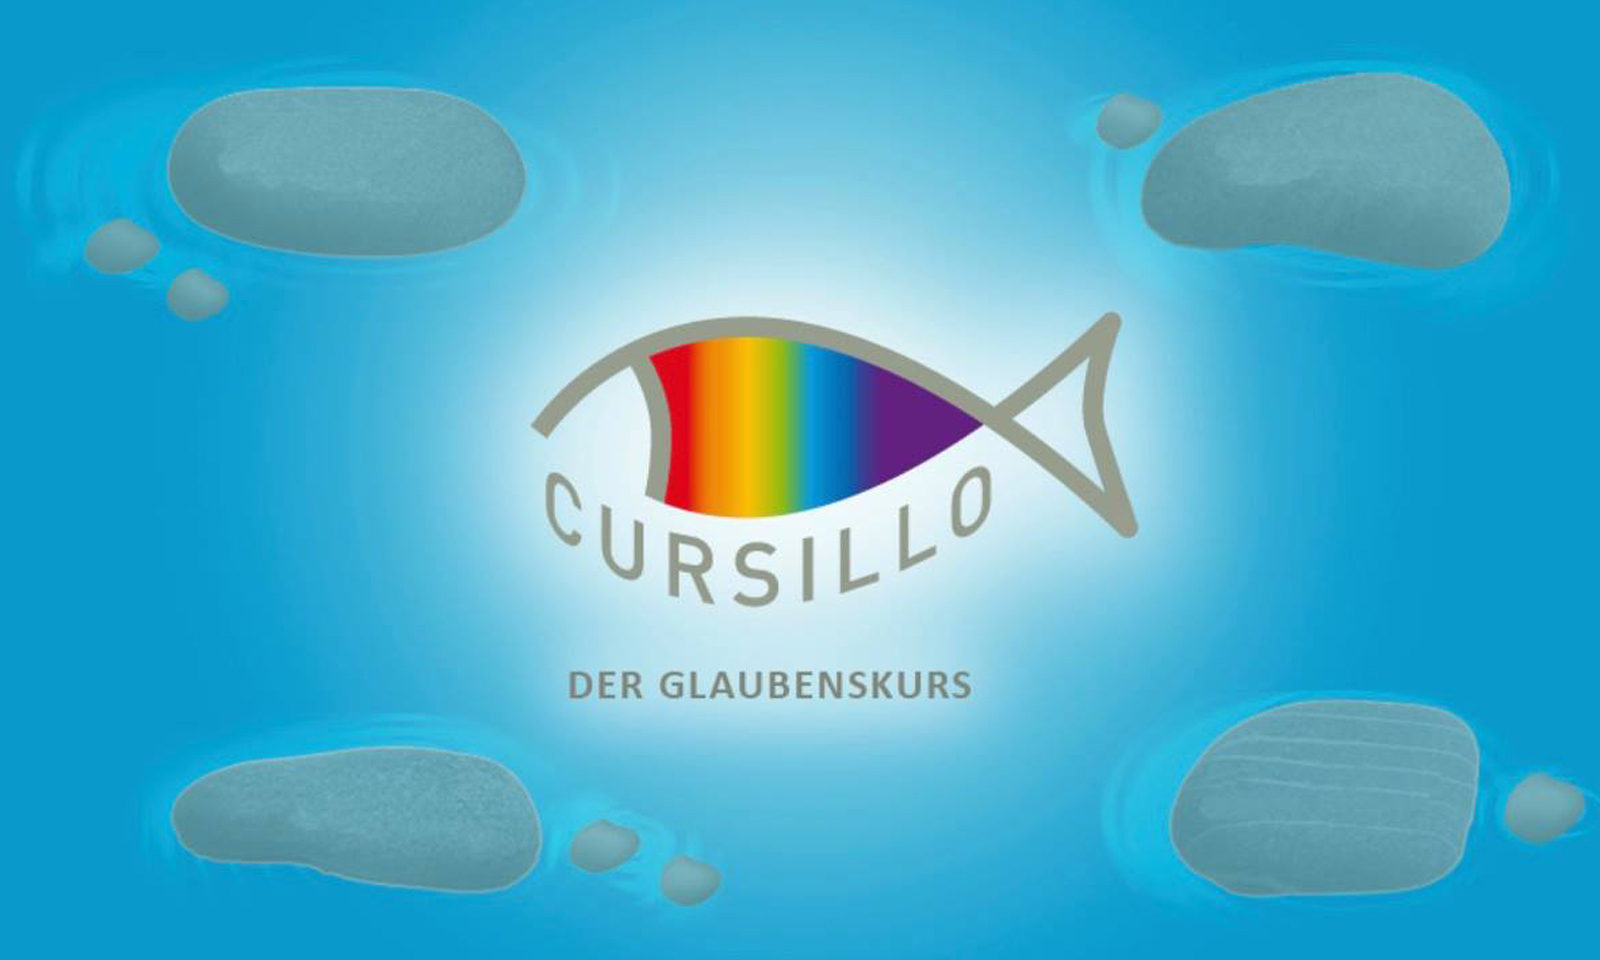 191205_Cursillo-Glaubenskurs_VA1